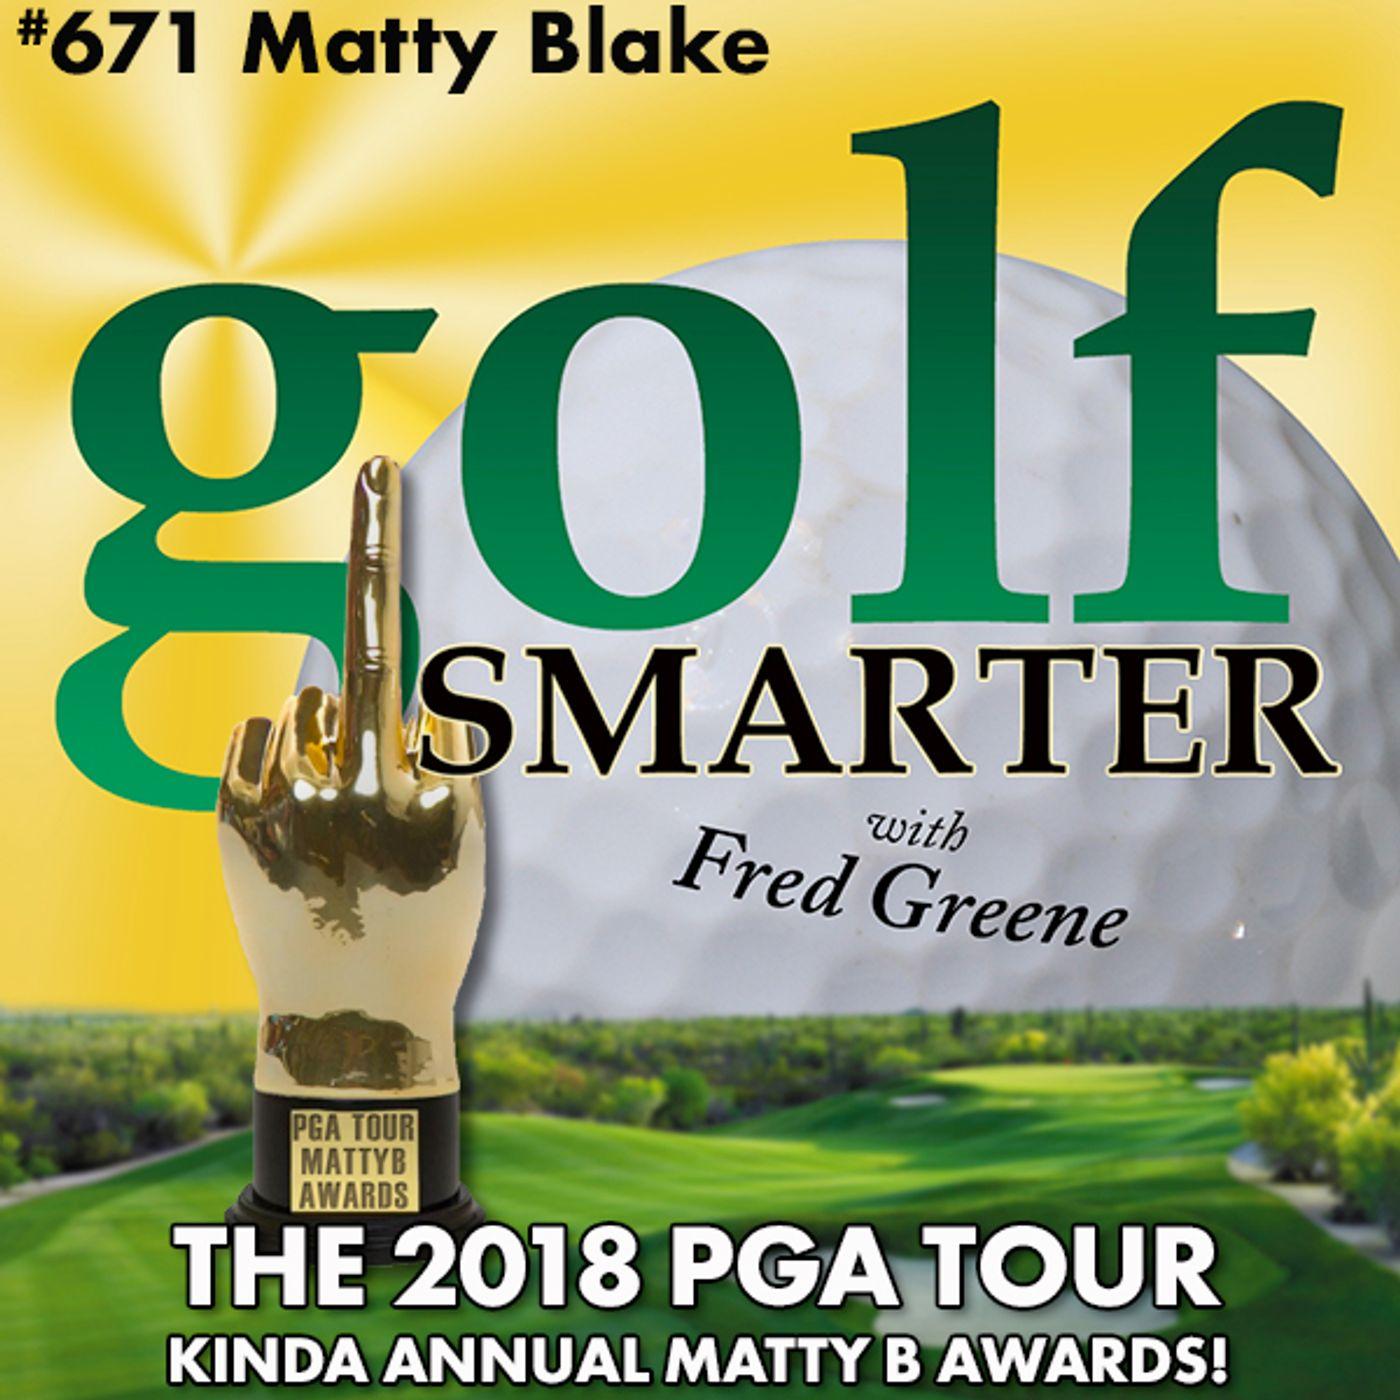 The 2018 PGA Tour Kinda Annual MattyB Awards